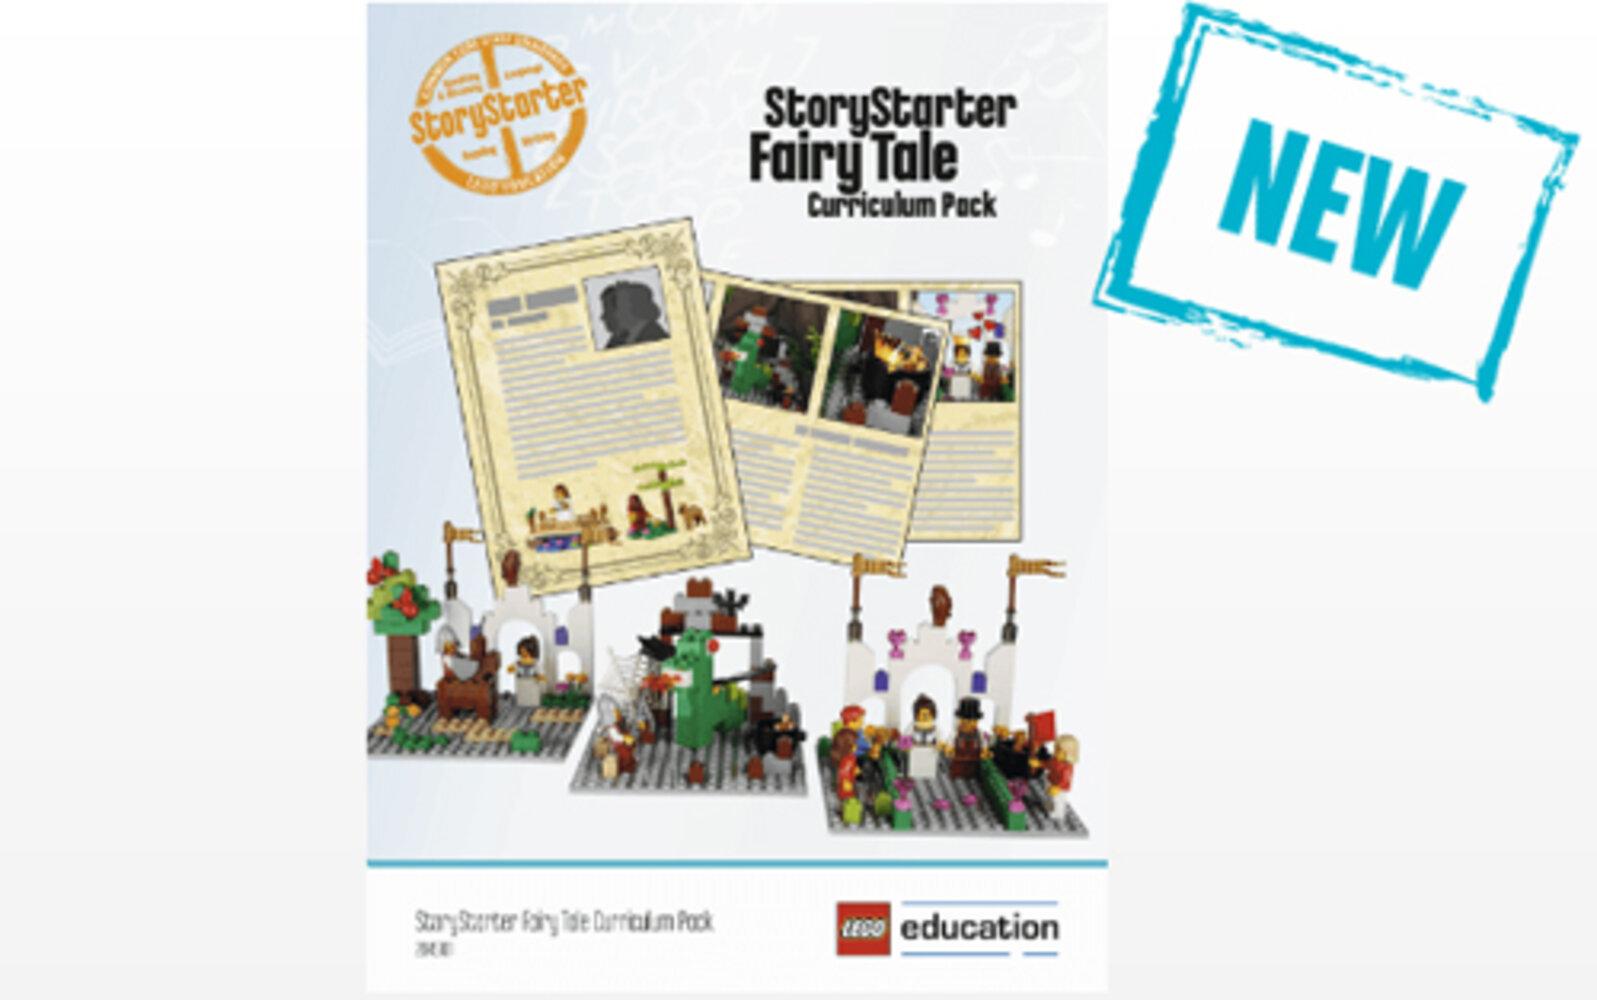 StoryStarter Fairy Tale Curriculum Pack